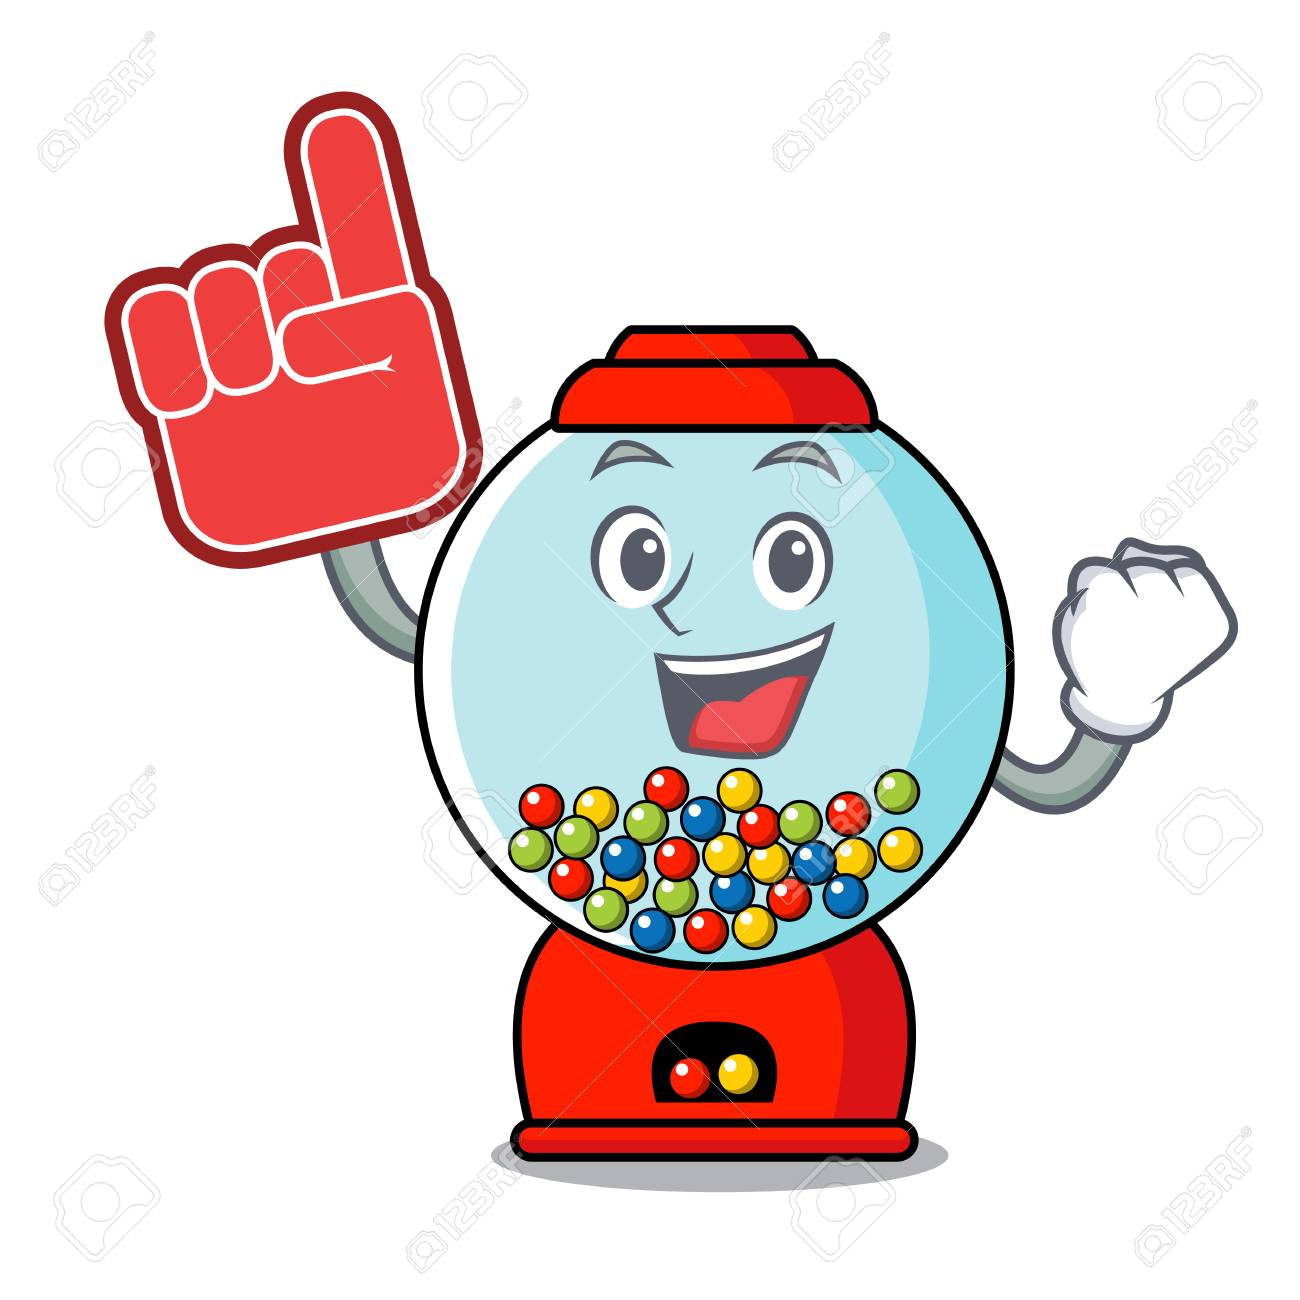 hight resolution of foam finger gumball machine mascot cartoon vector illustration stock vector 103552210